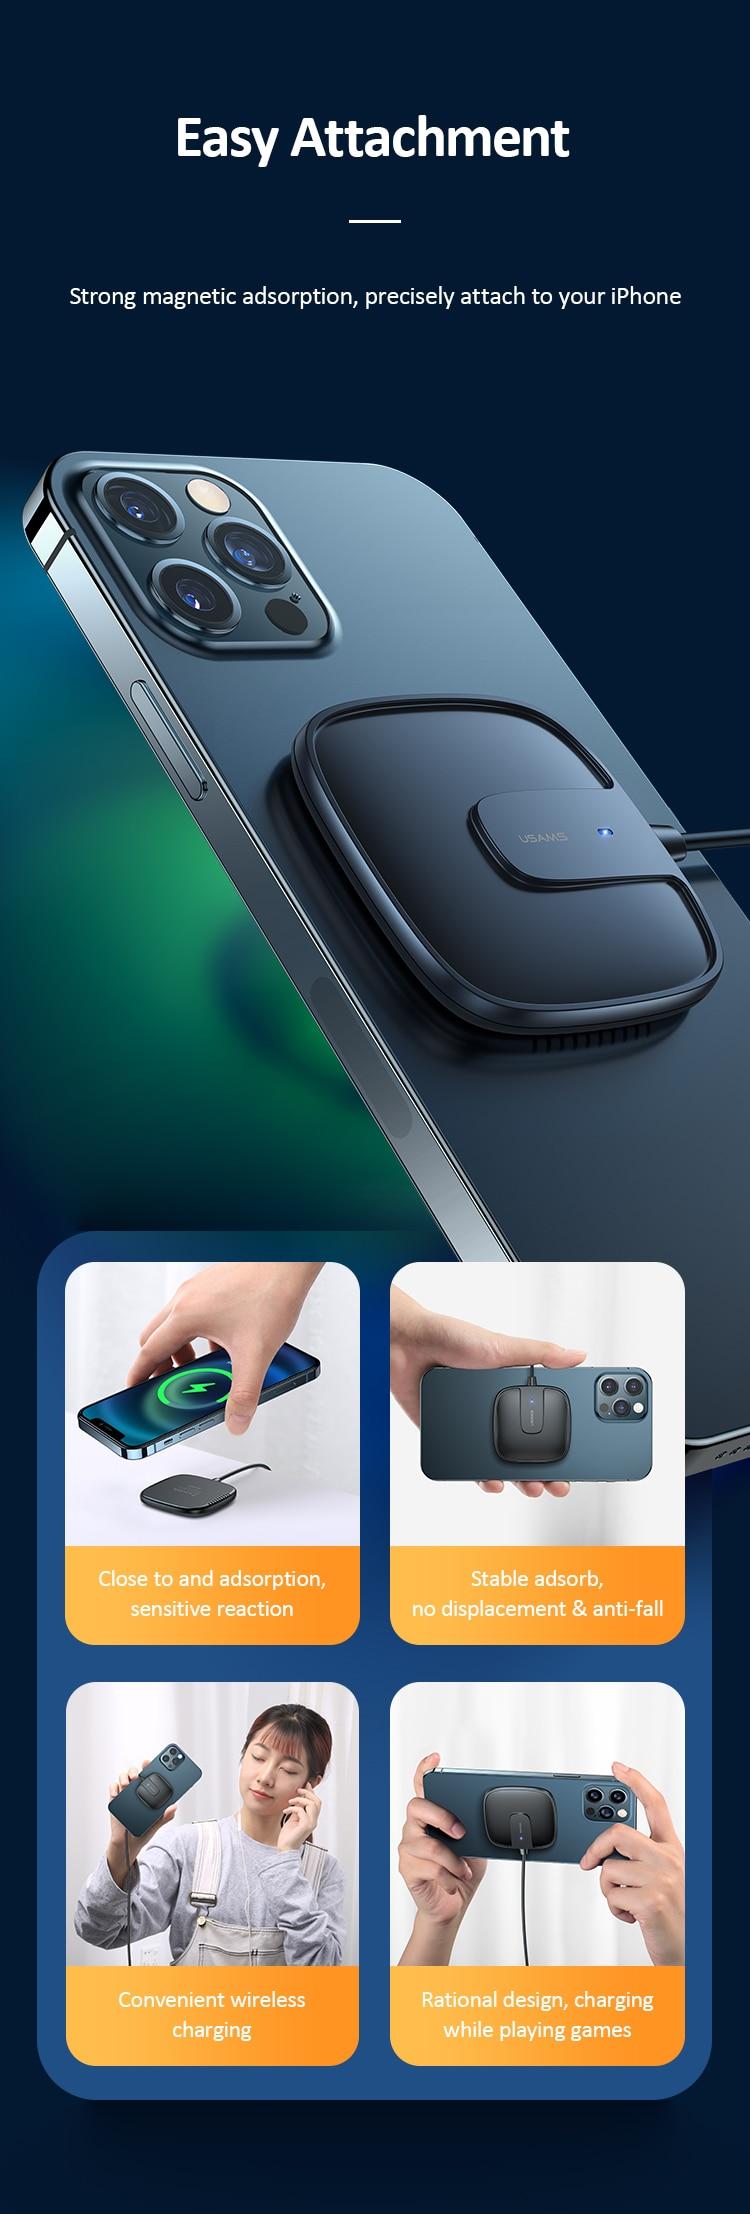 W1-苹果超薄磁吸无线快充充电器带线款-US-CD159_03